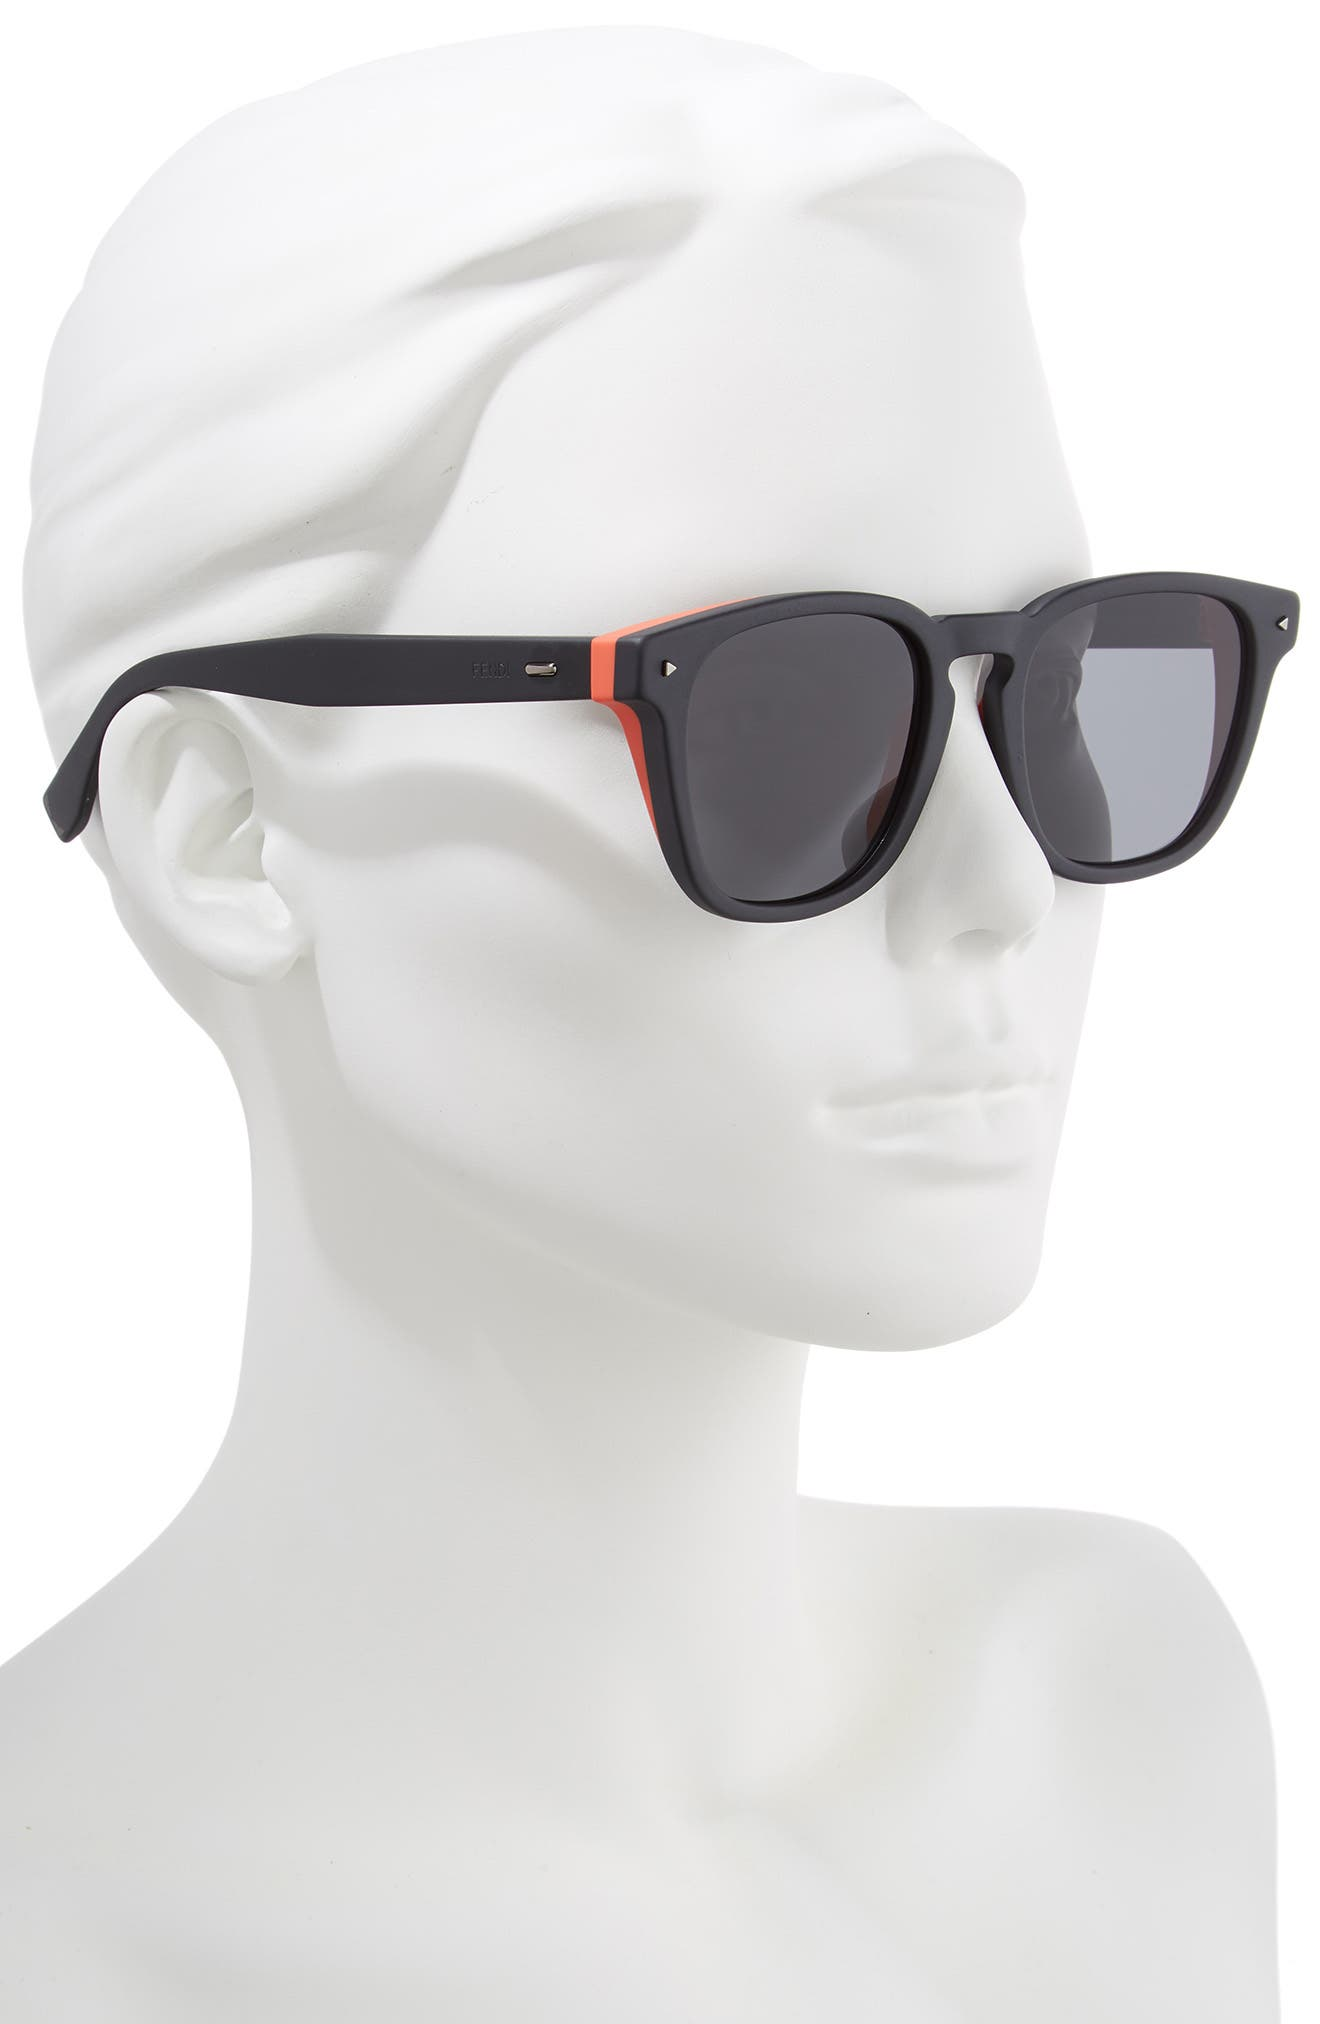 52mm Sunglasses,                             Alternate thumbnail 2, color,                             BLACK